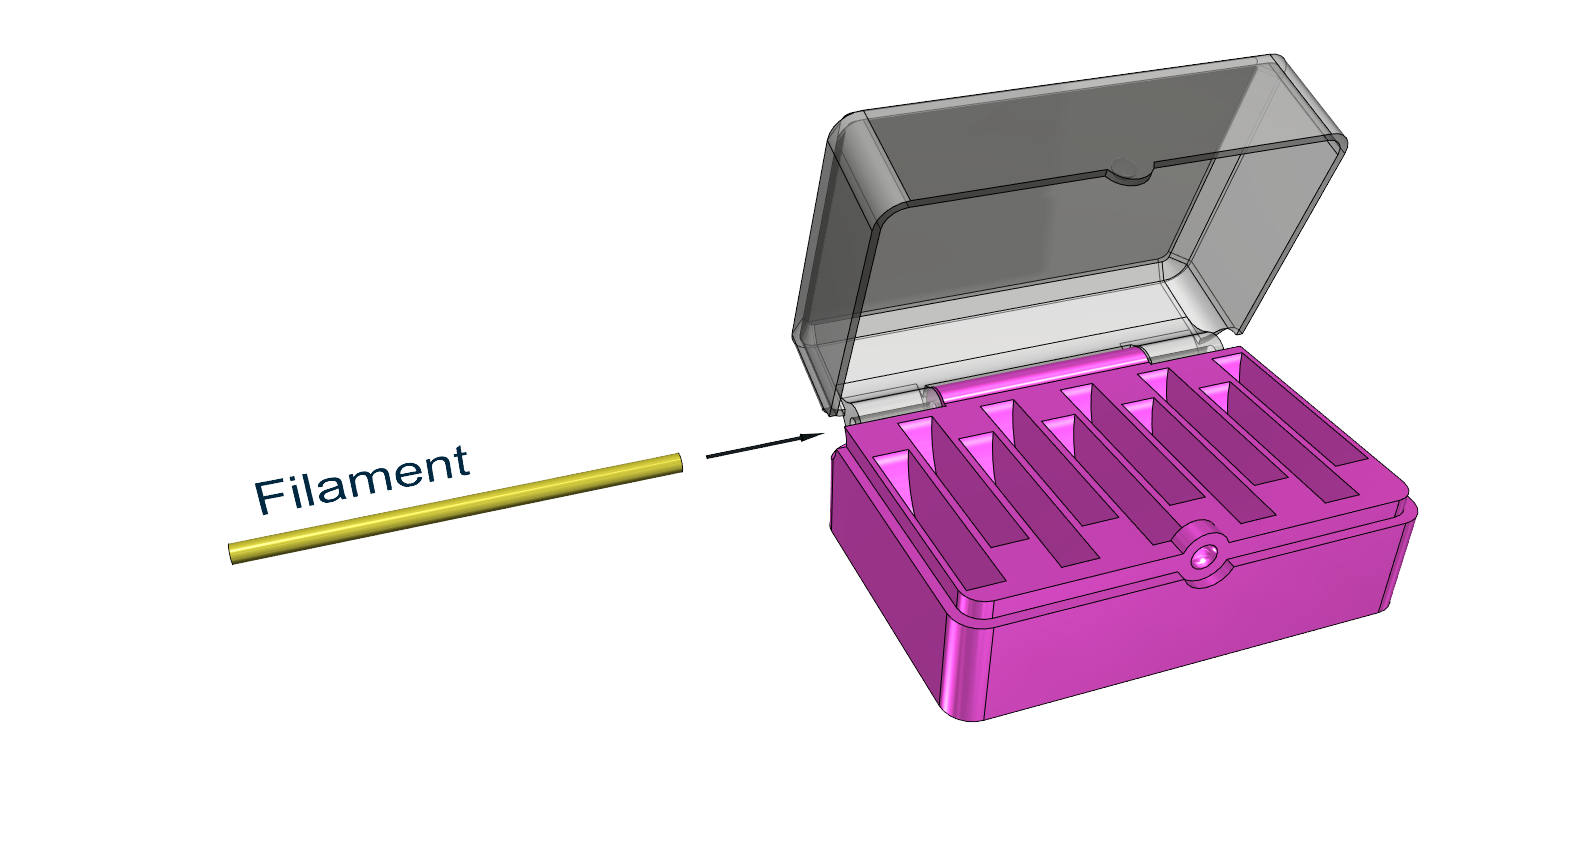 notice1.png Download free STL file CR2032, LR44, AG13 Coin Battery Case • 3D printable object, parkgwansu339